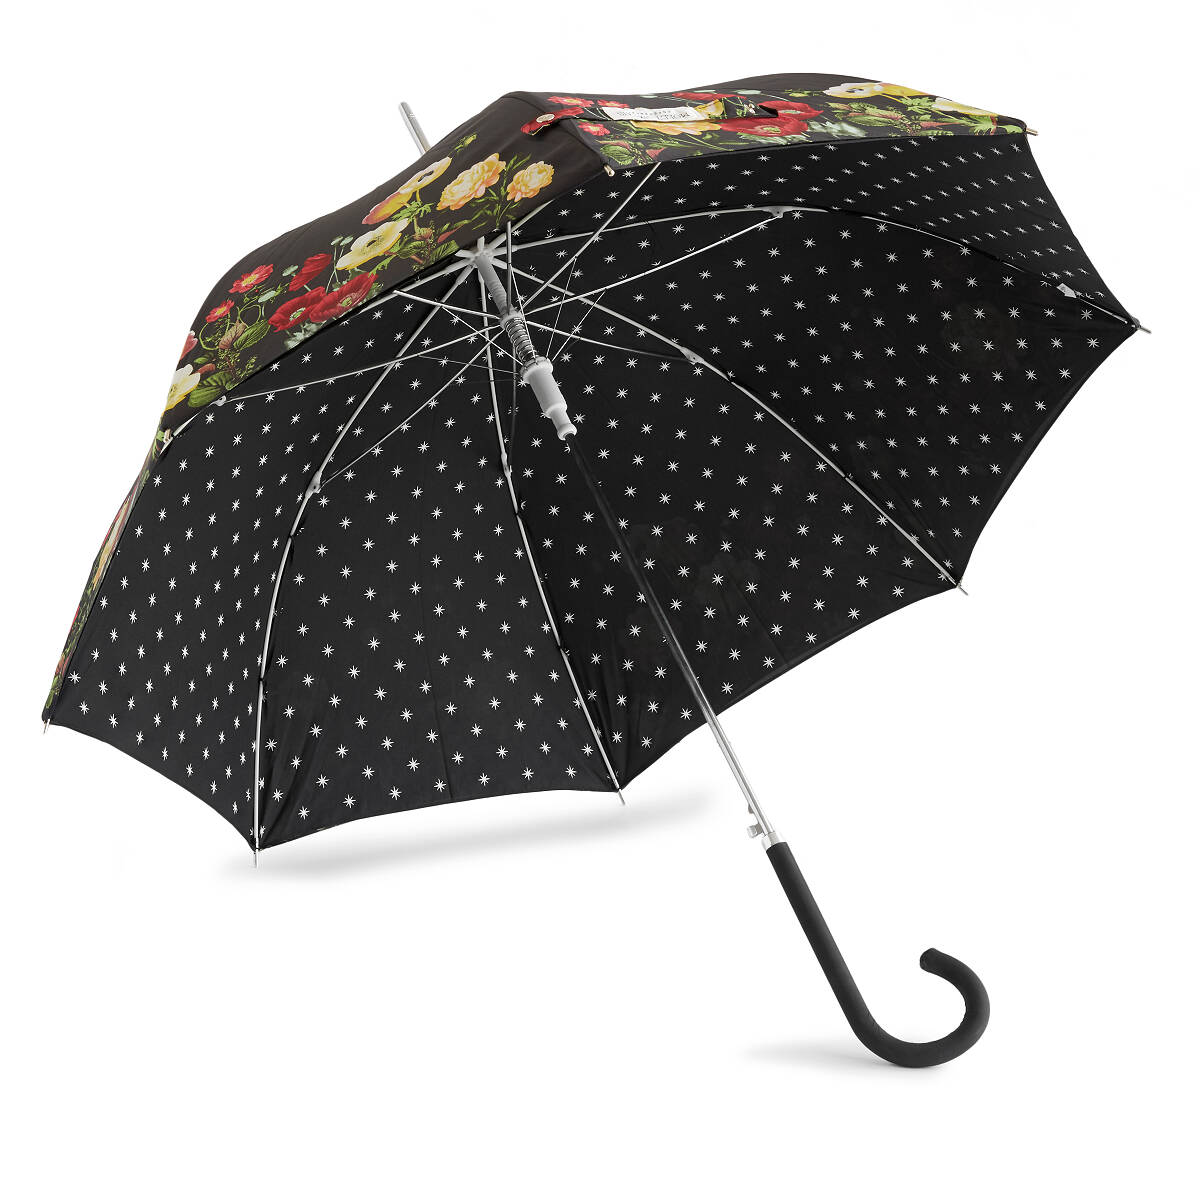 Floral Garden Umbrella pagoda umbrella parasol UncommonGoods